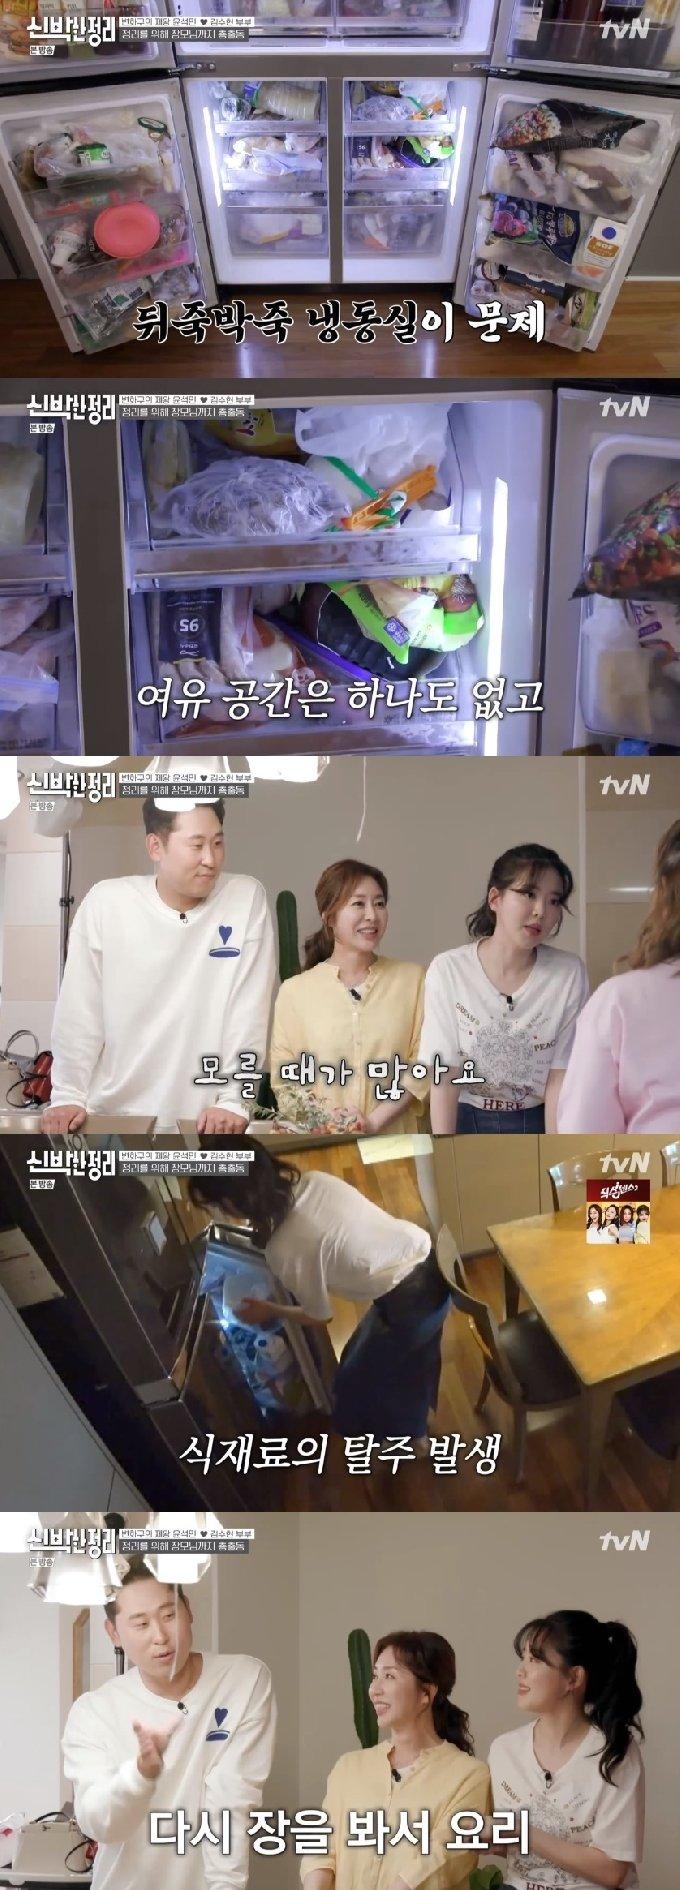 tvN '신박한 정리' 캡처 © 뉴스1